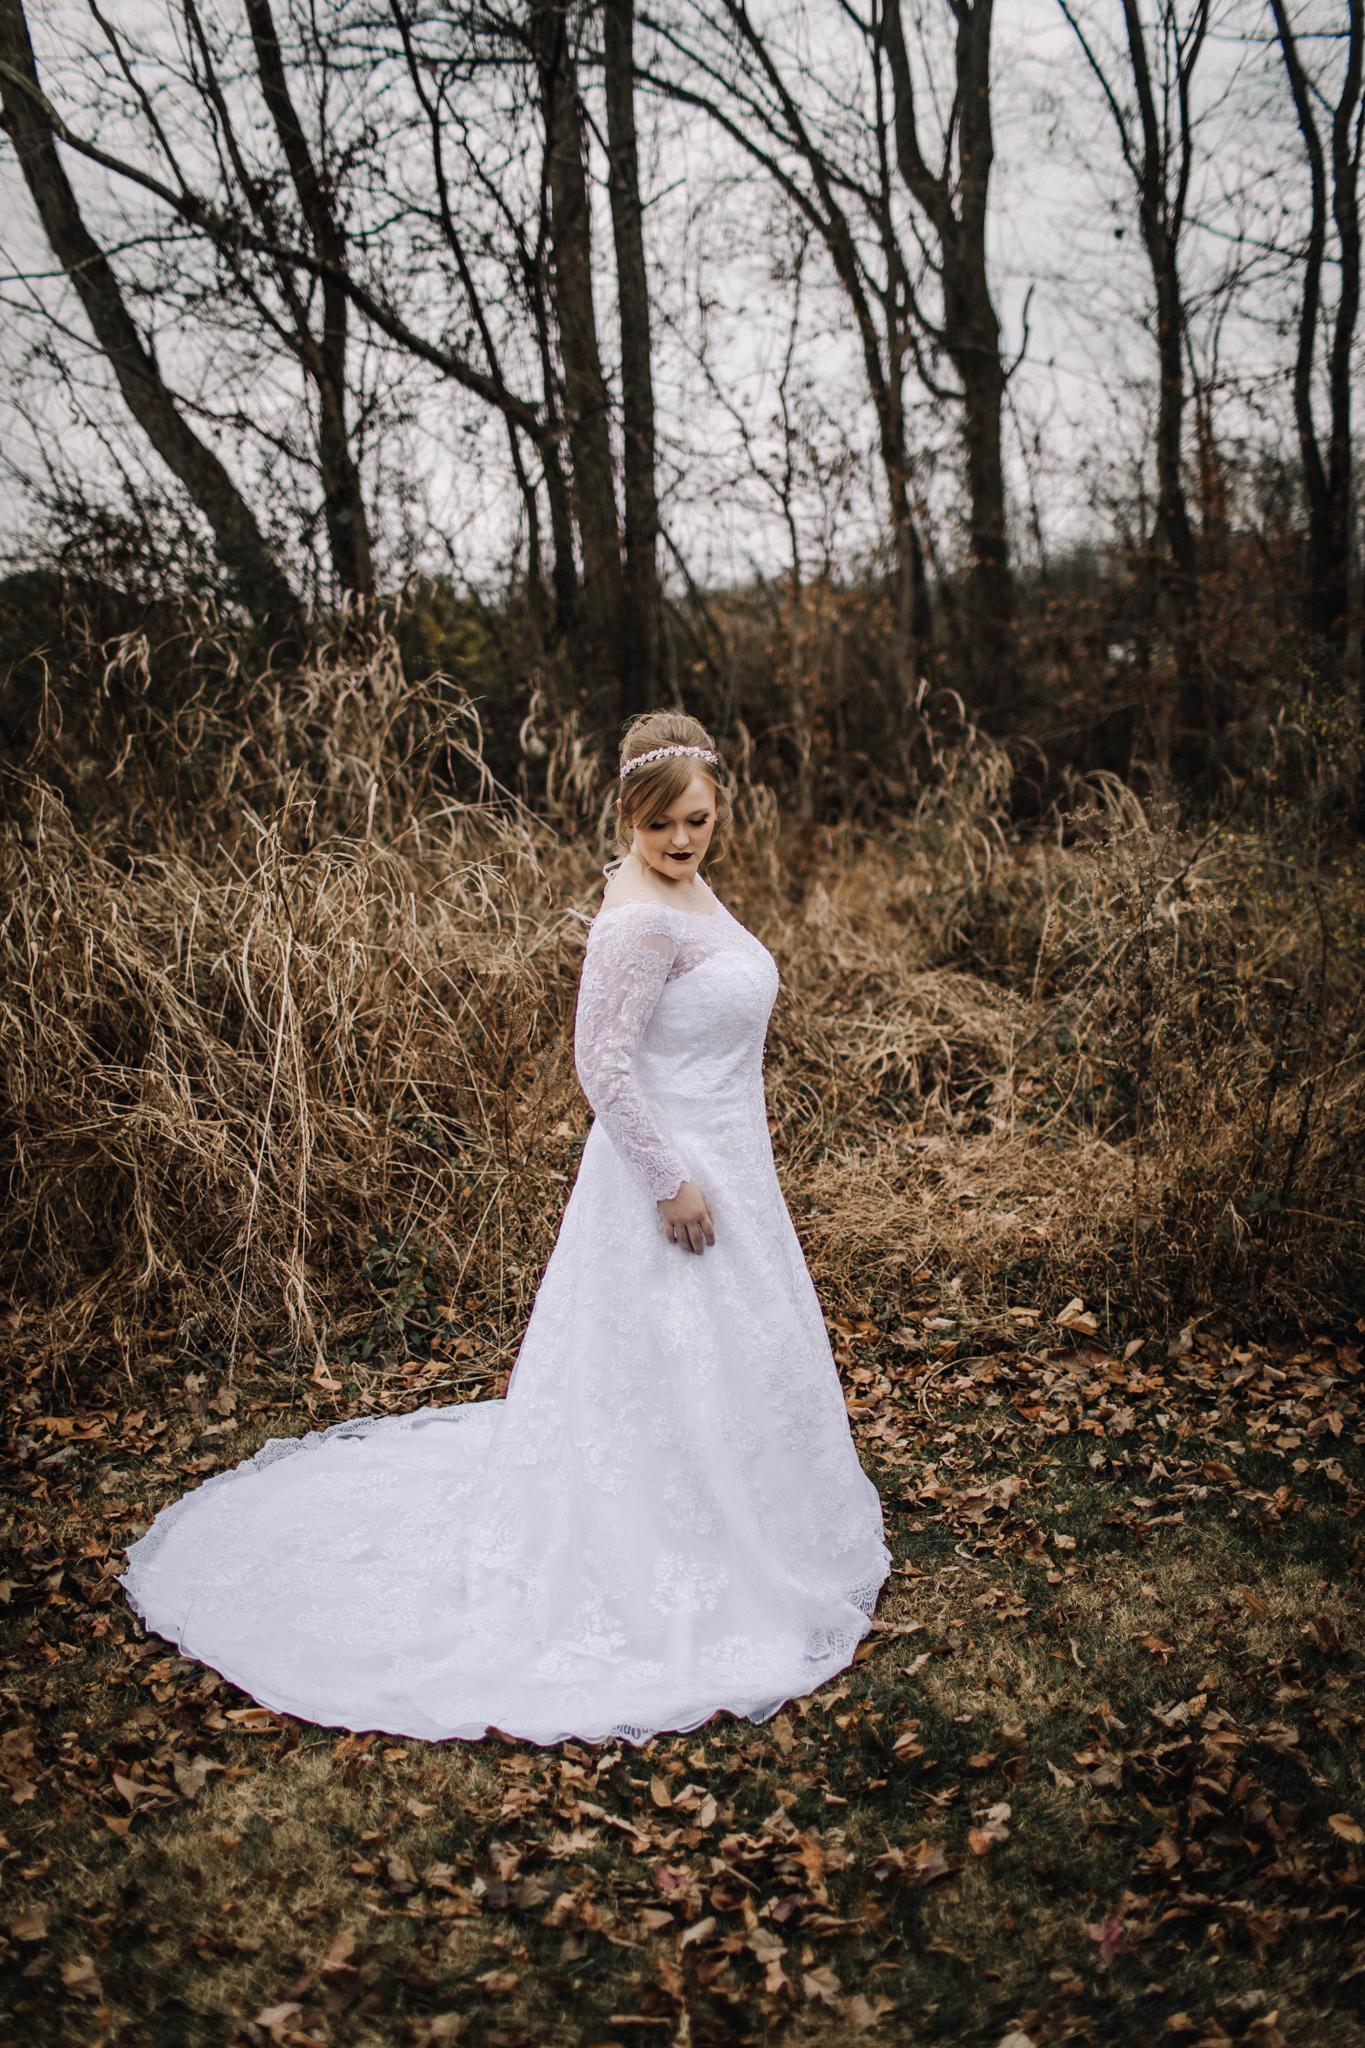 billie-shaye-style-photography-www.billieshayestyle.com-winter-wedding-the-belle-hollow-clarksville-tennessee-8987.jpg